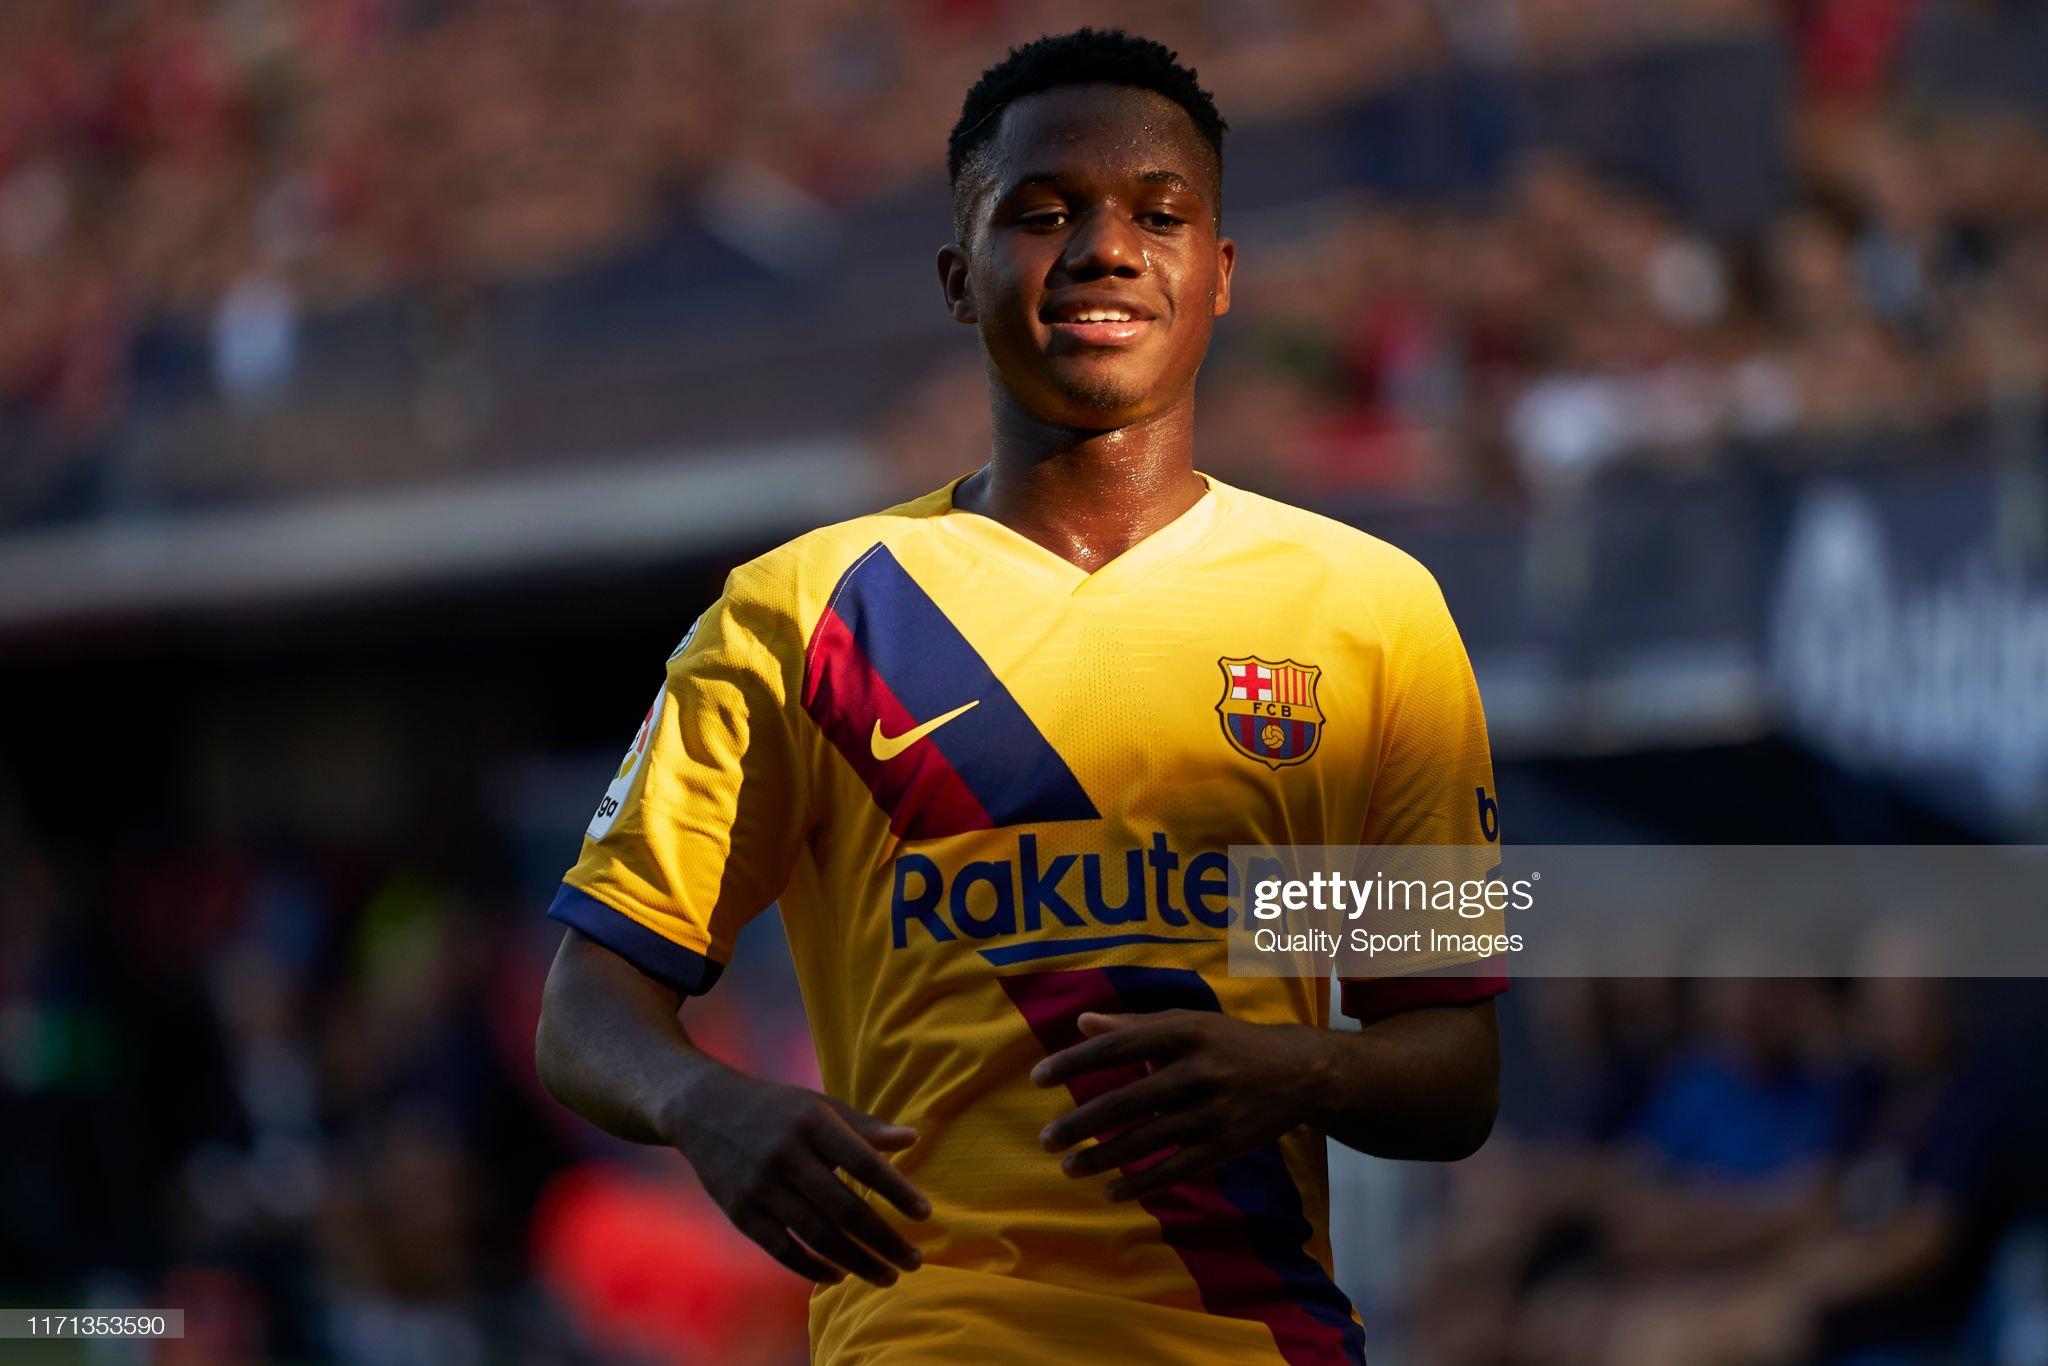 صور مباراة : أوساسونا - برشلونة 2-2 ( 31-08-2019 )  Anssumane-fati-of-fc-barcelona-looks-on-during-the-liga-match-between-picture-id1171353590?s=2048x2048